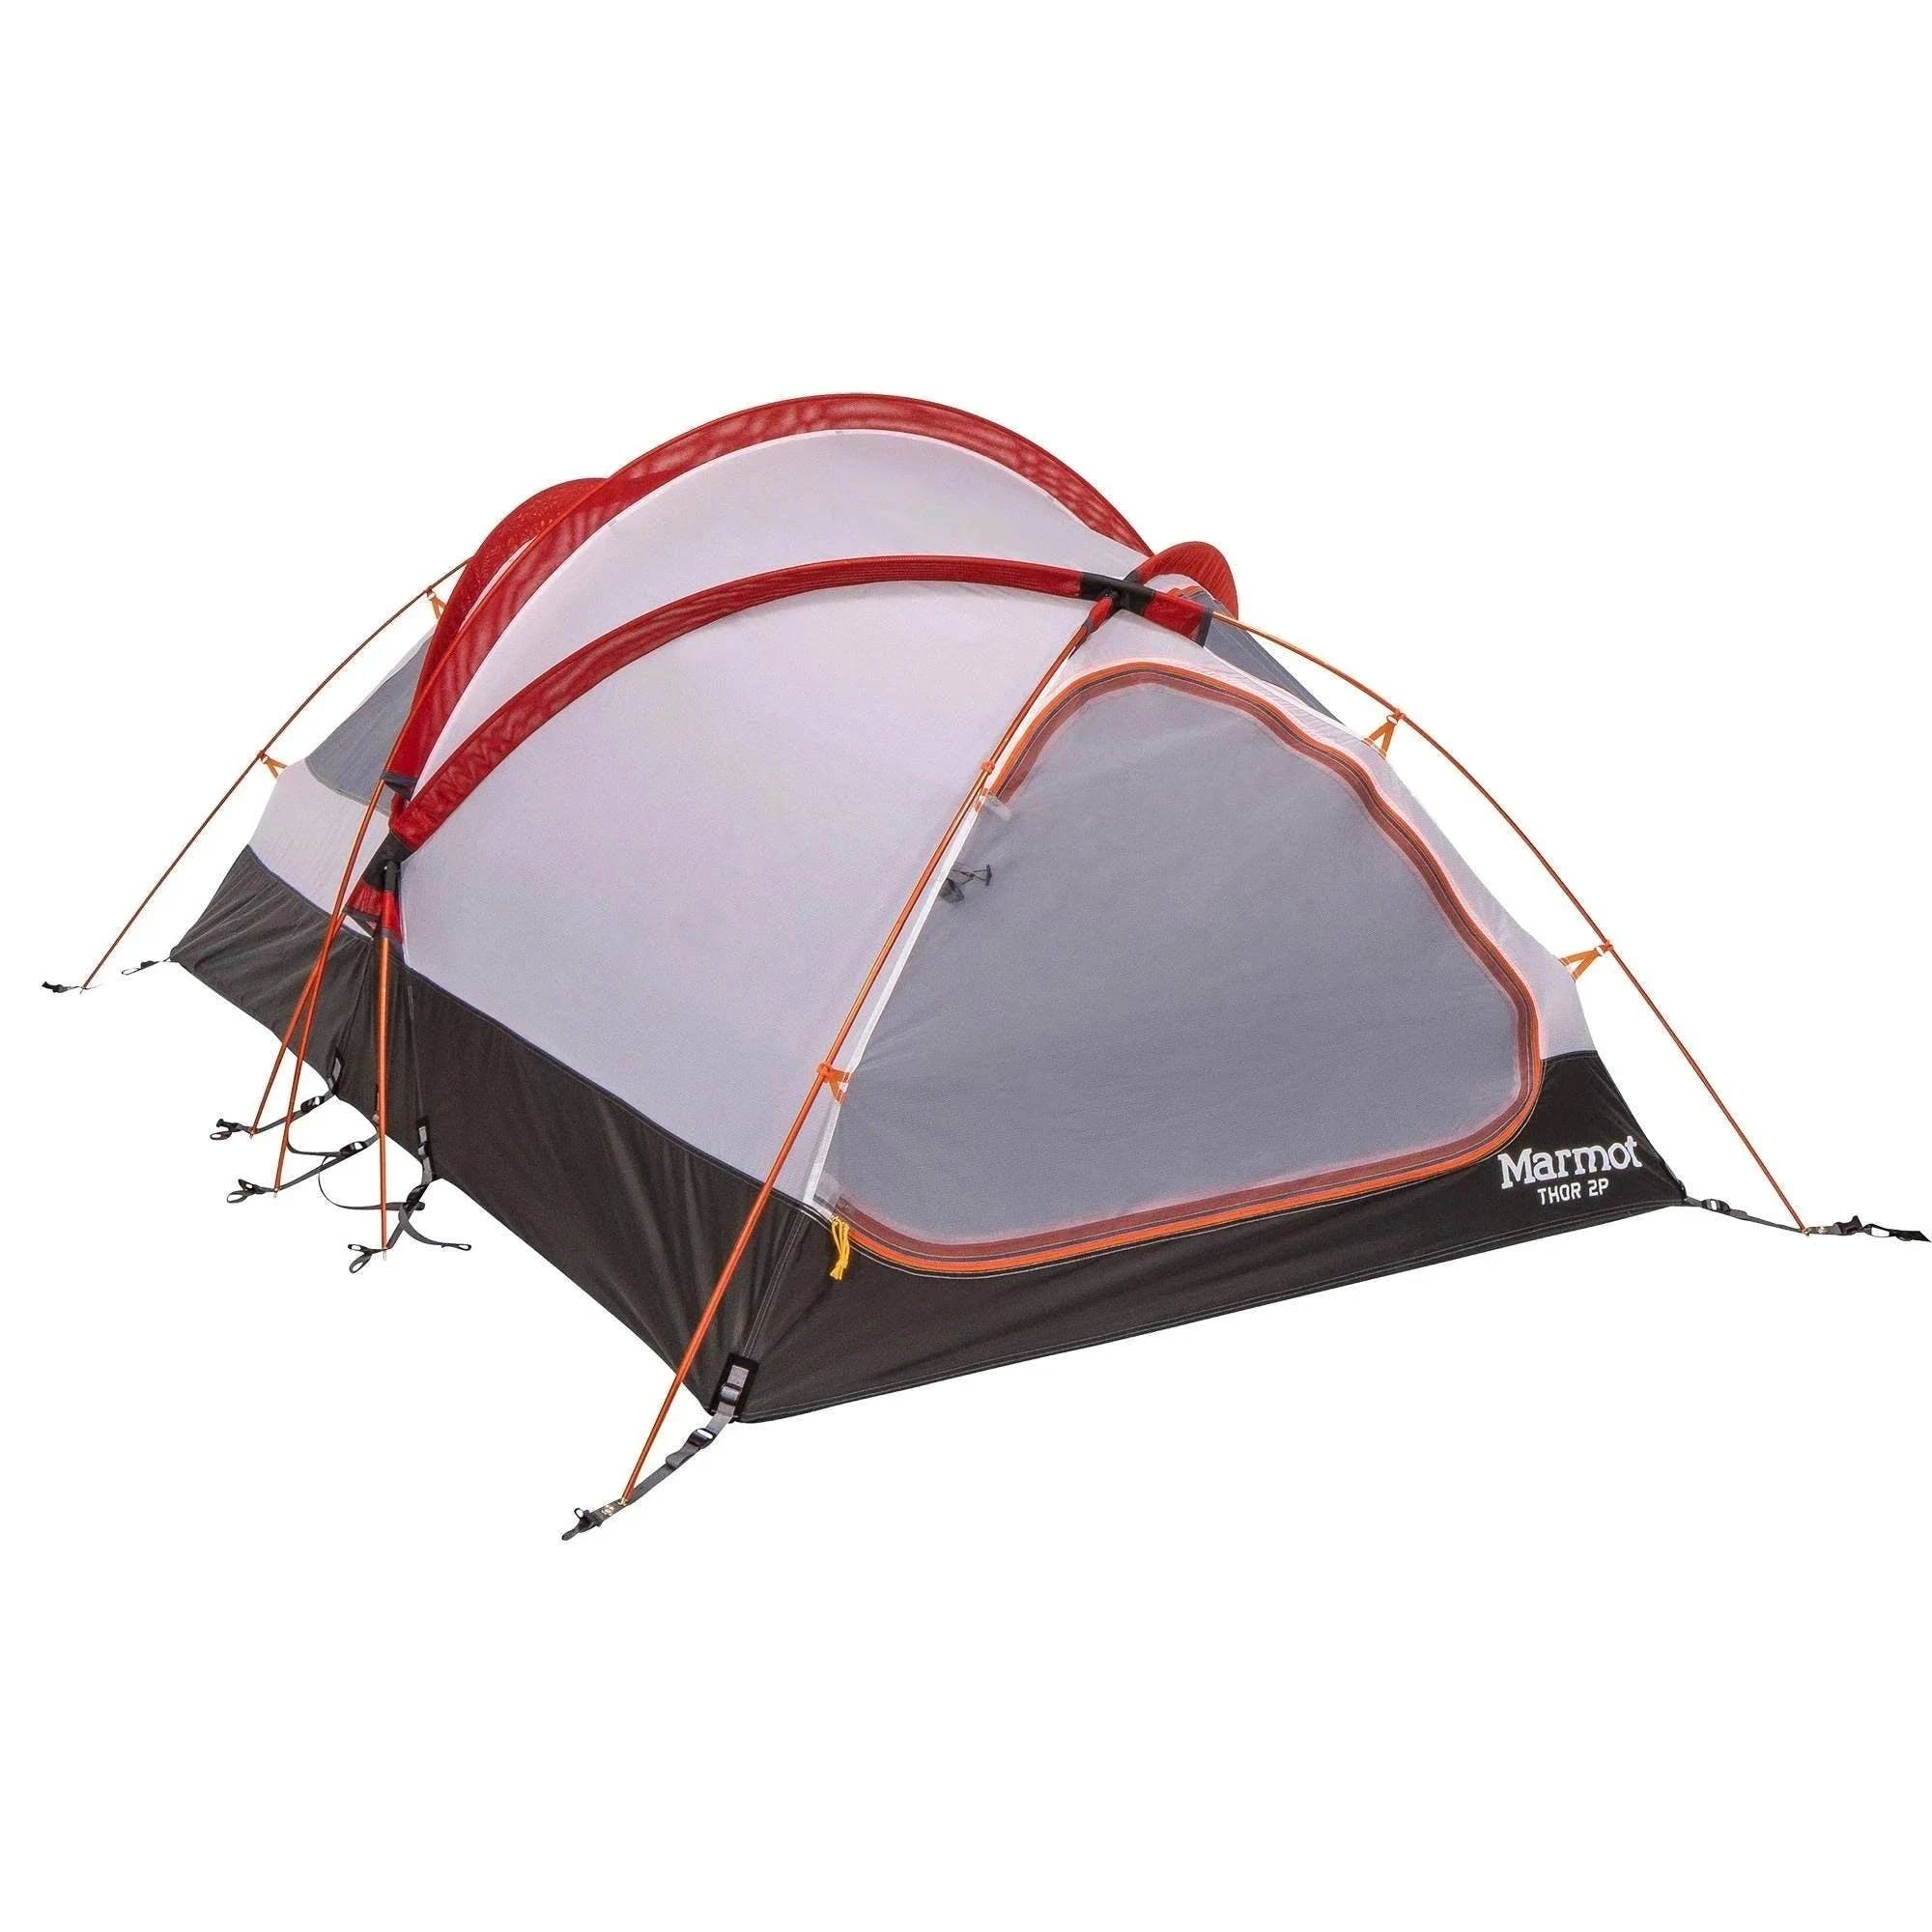 Marmot Thor 2p Tent - 2 Person / Blaze